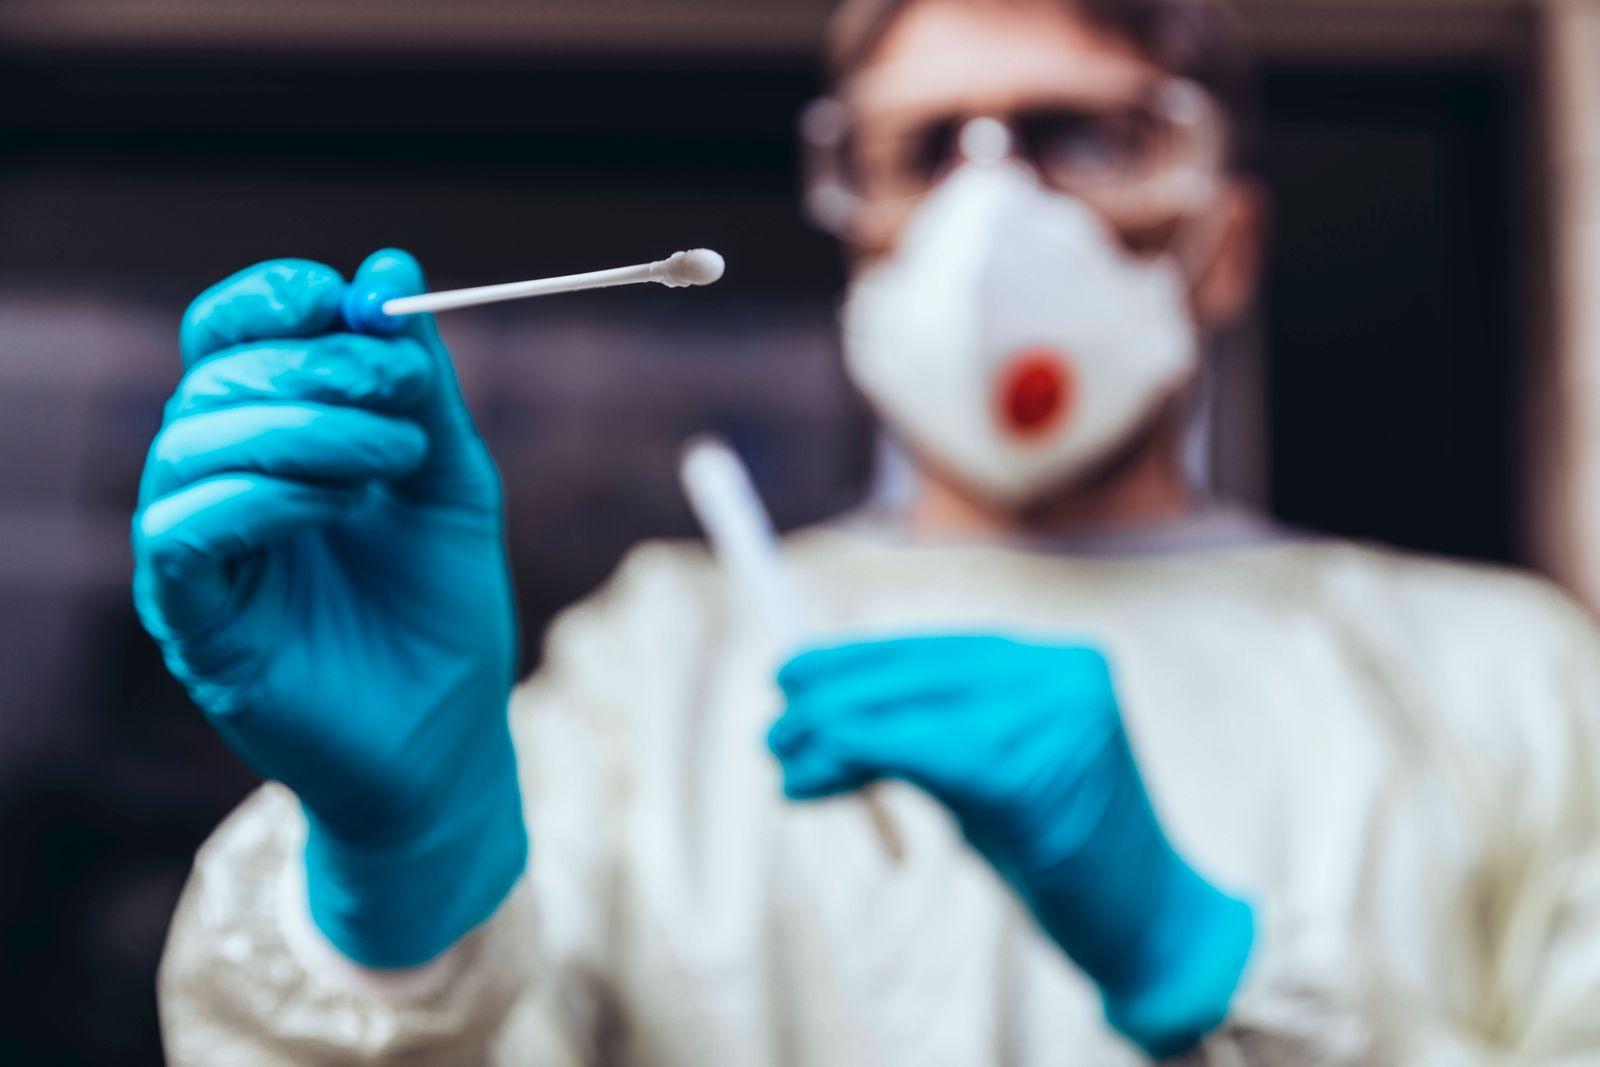 Healthcare worker holding swab test kit for PCR testing model released Symbolfoto MFF05400